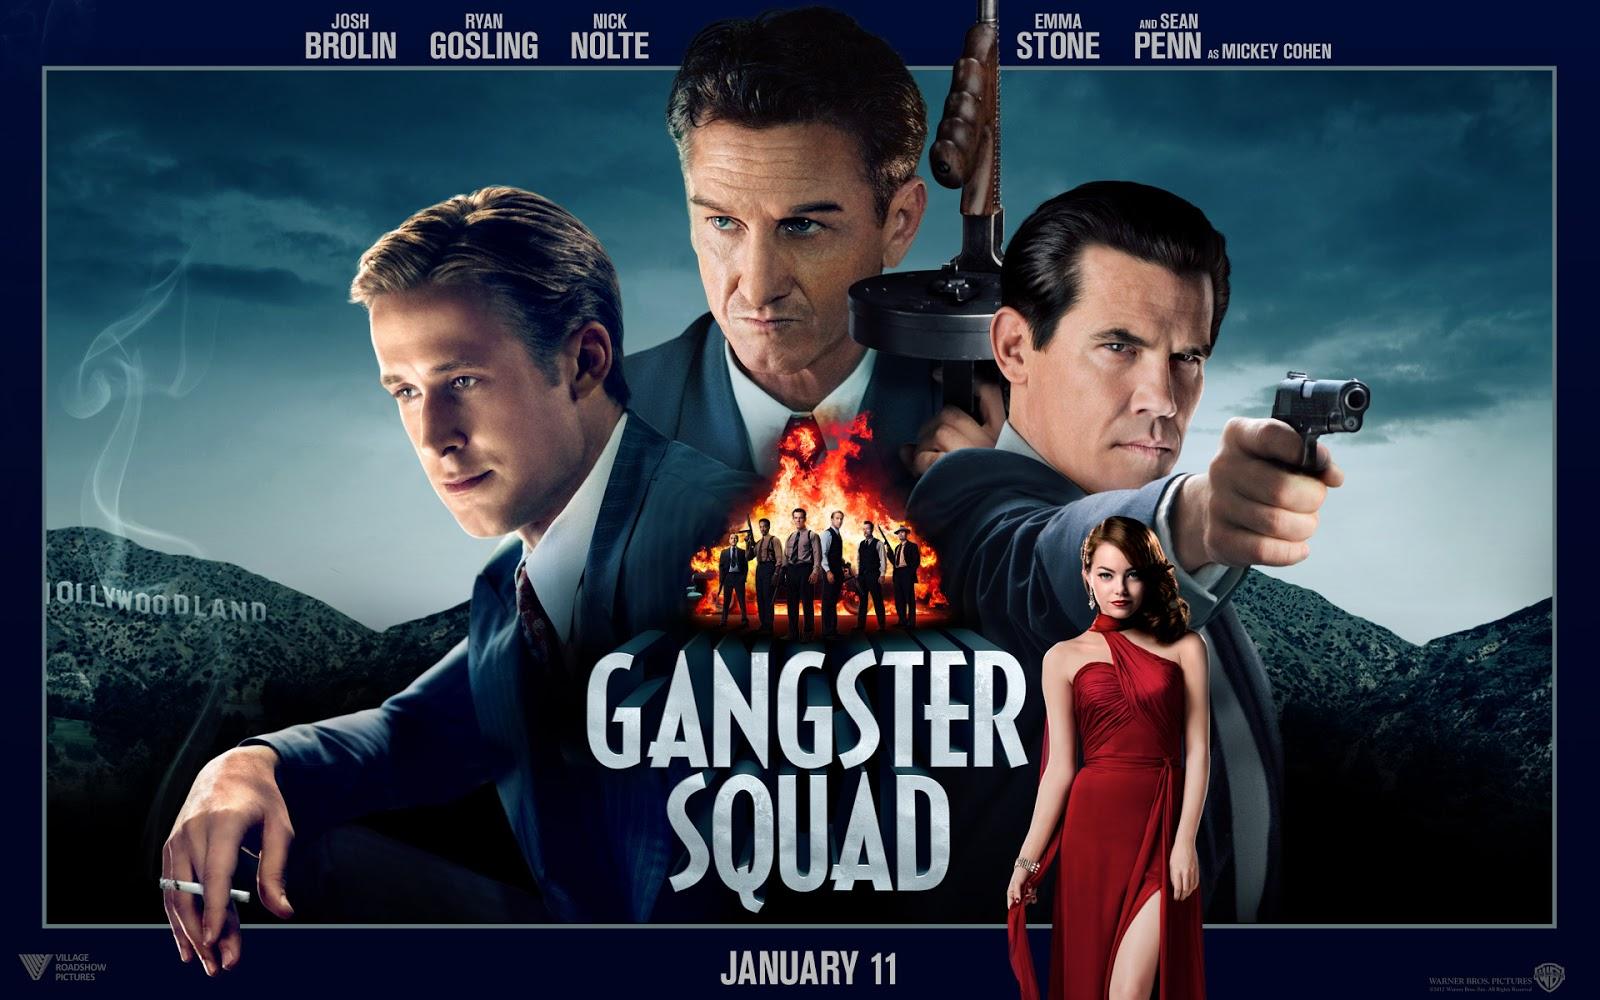 http://2.bp.blogspot.com/-qwJLGVGlcT8/UPZzA6Qa_lI/AAAAAAAAAW0/jzDoiLDhqio/s1600/gangster_squad-wide.jpg